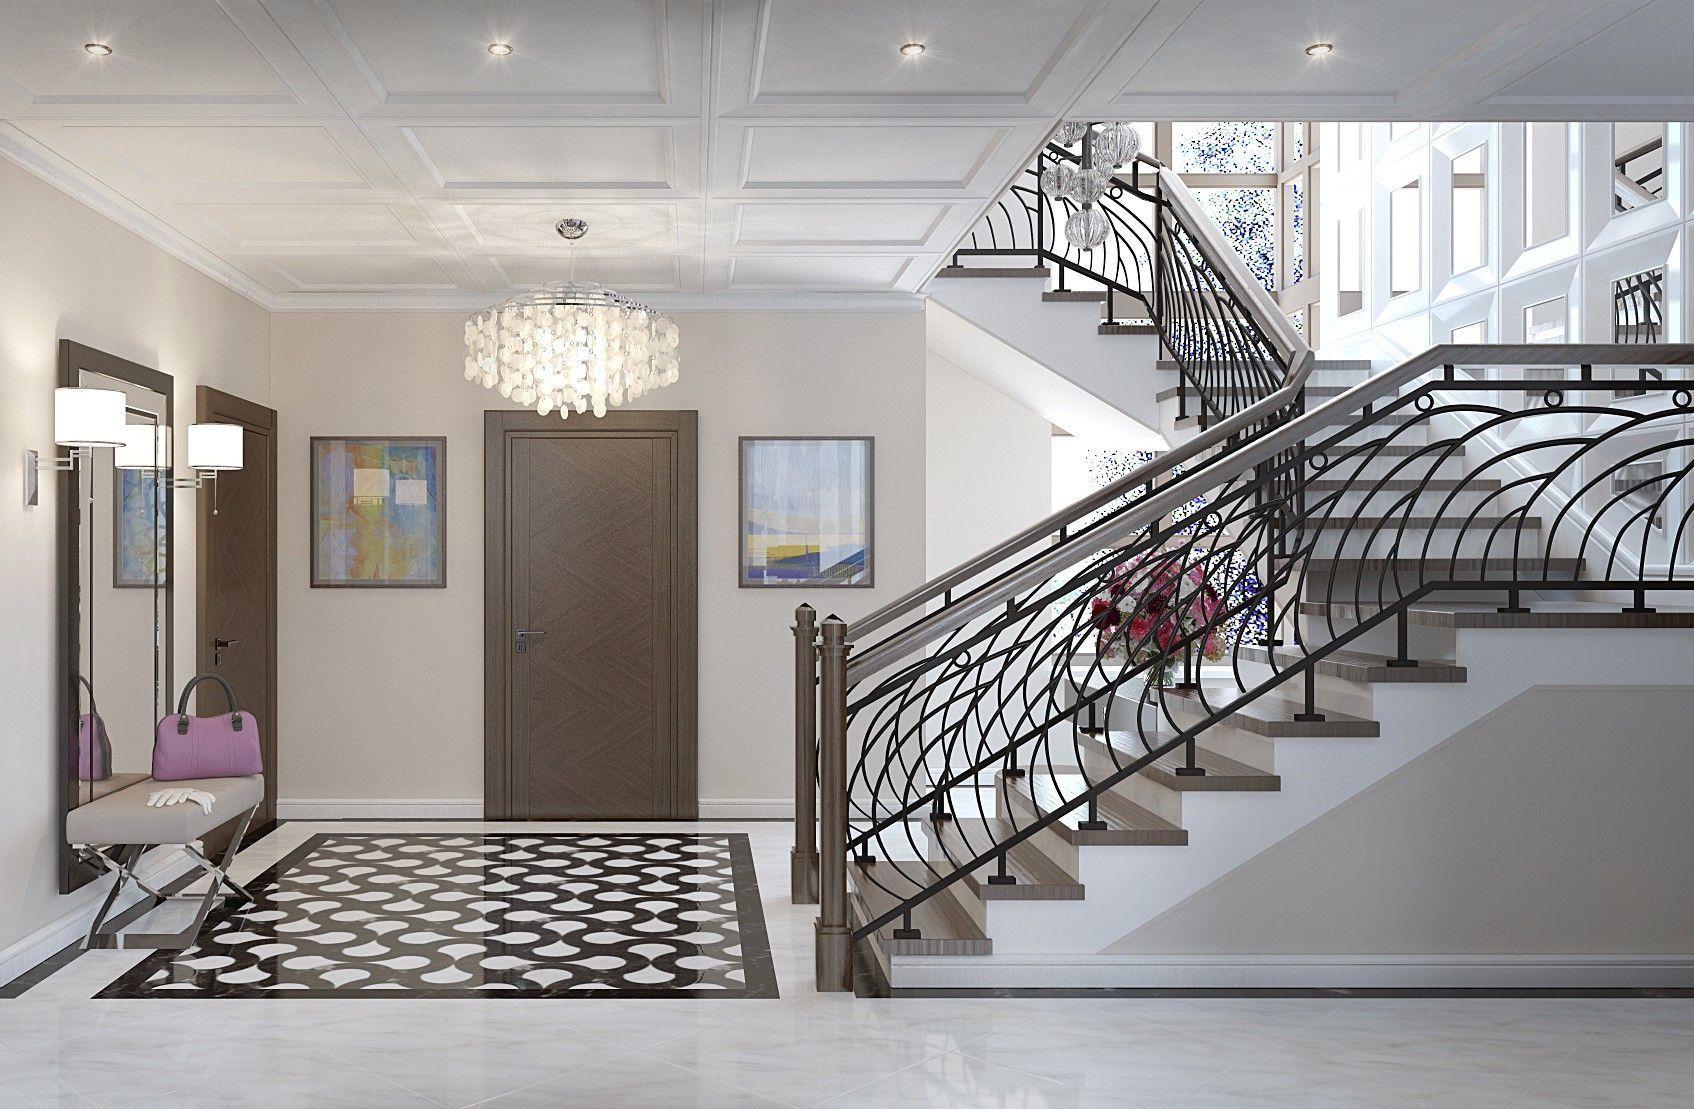 Холл 1-го этажа. Дизайн интерьера дома.